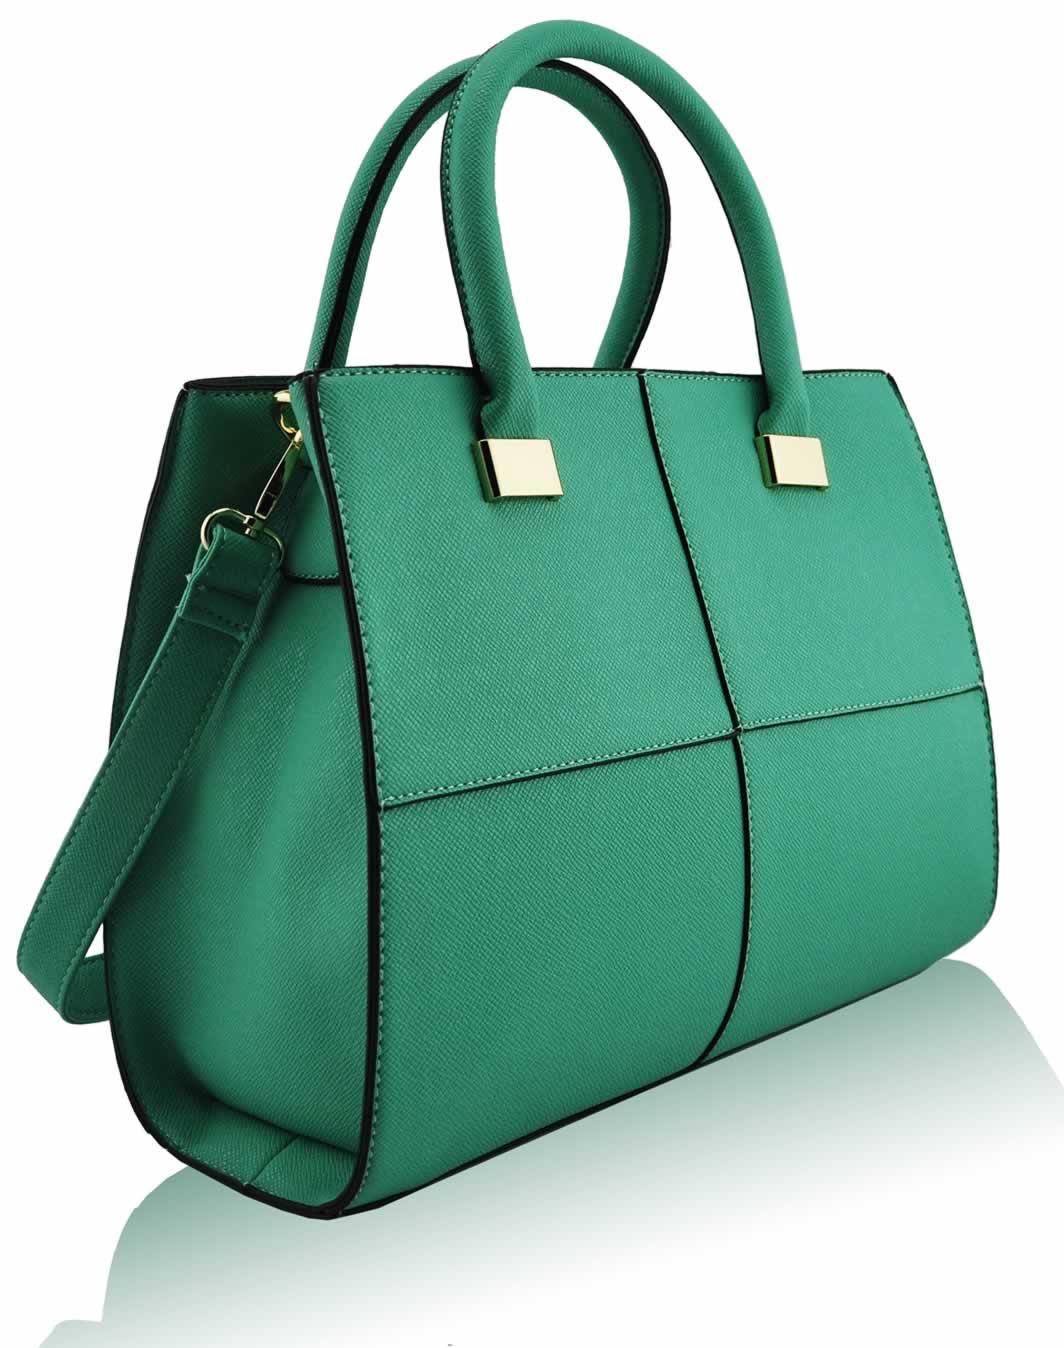 Wholesale Emerald Fashion Tote Handbag